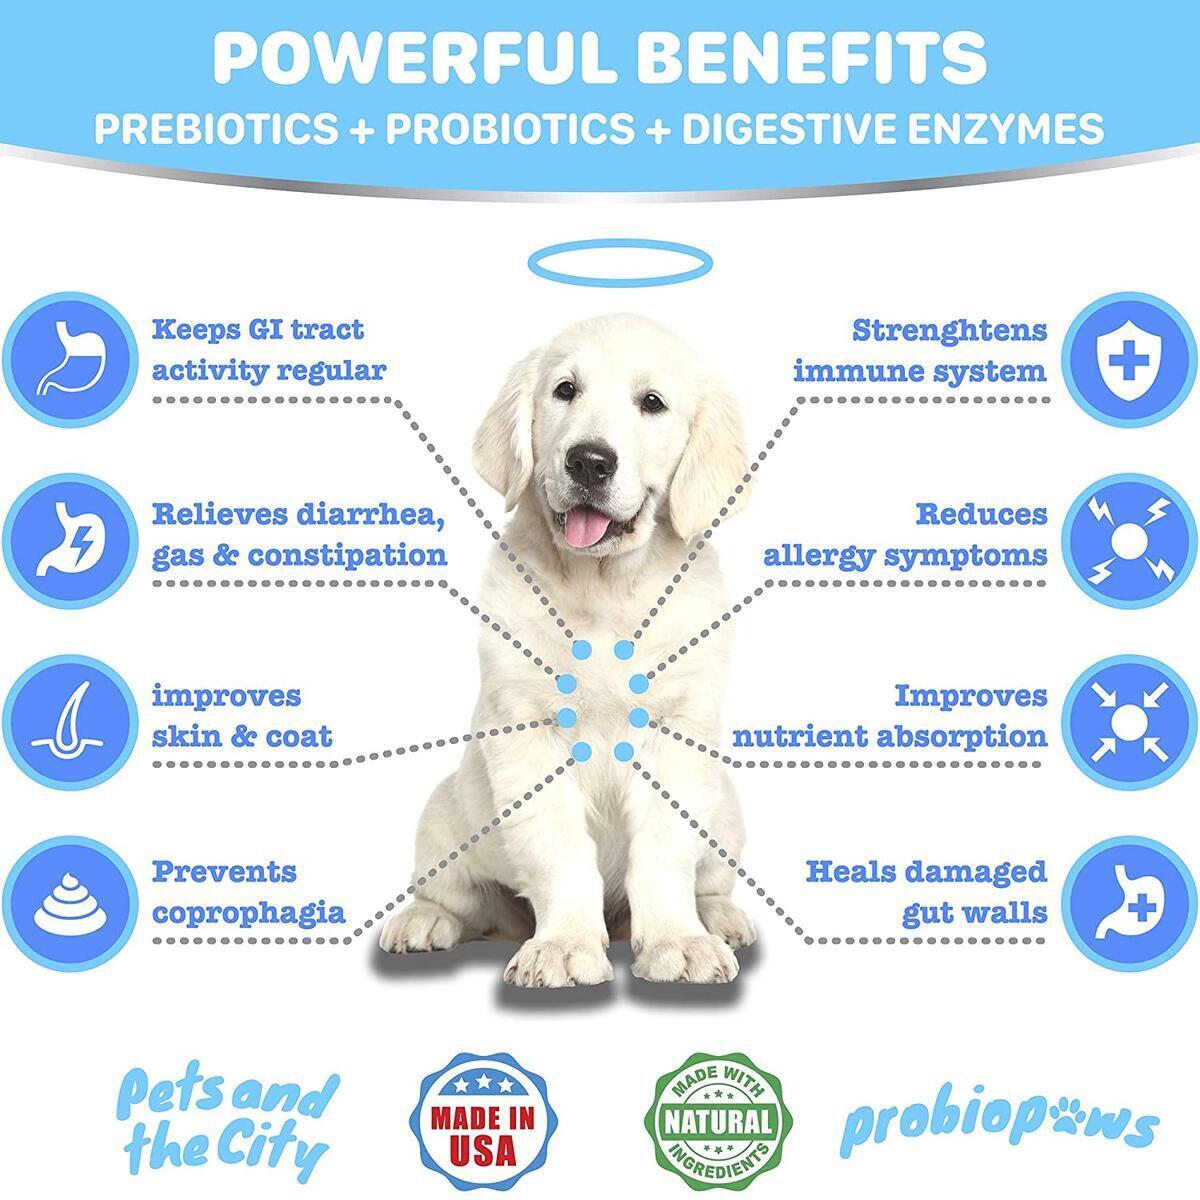 Probiotics for Dogs - Digestive Enzymes - 2 Billion CFUs Probiotics + Prebiotics - Relieves Diarrhea, Gas & Allergy - Improves Digestion & Immunity - Coprophagia Treatment - 120 Chicken Flavor Treats